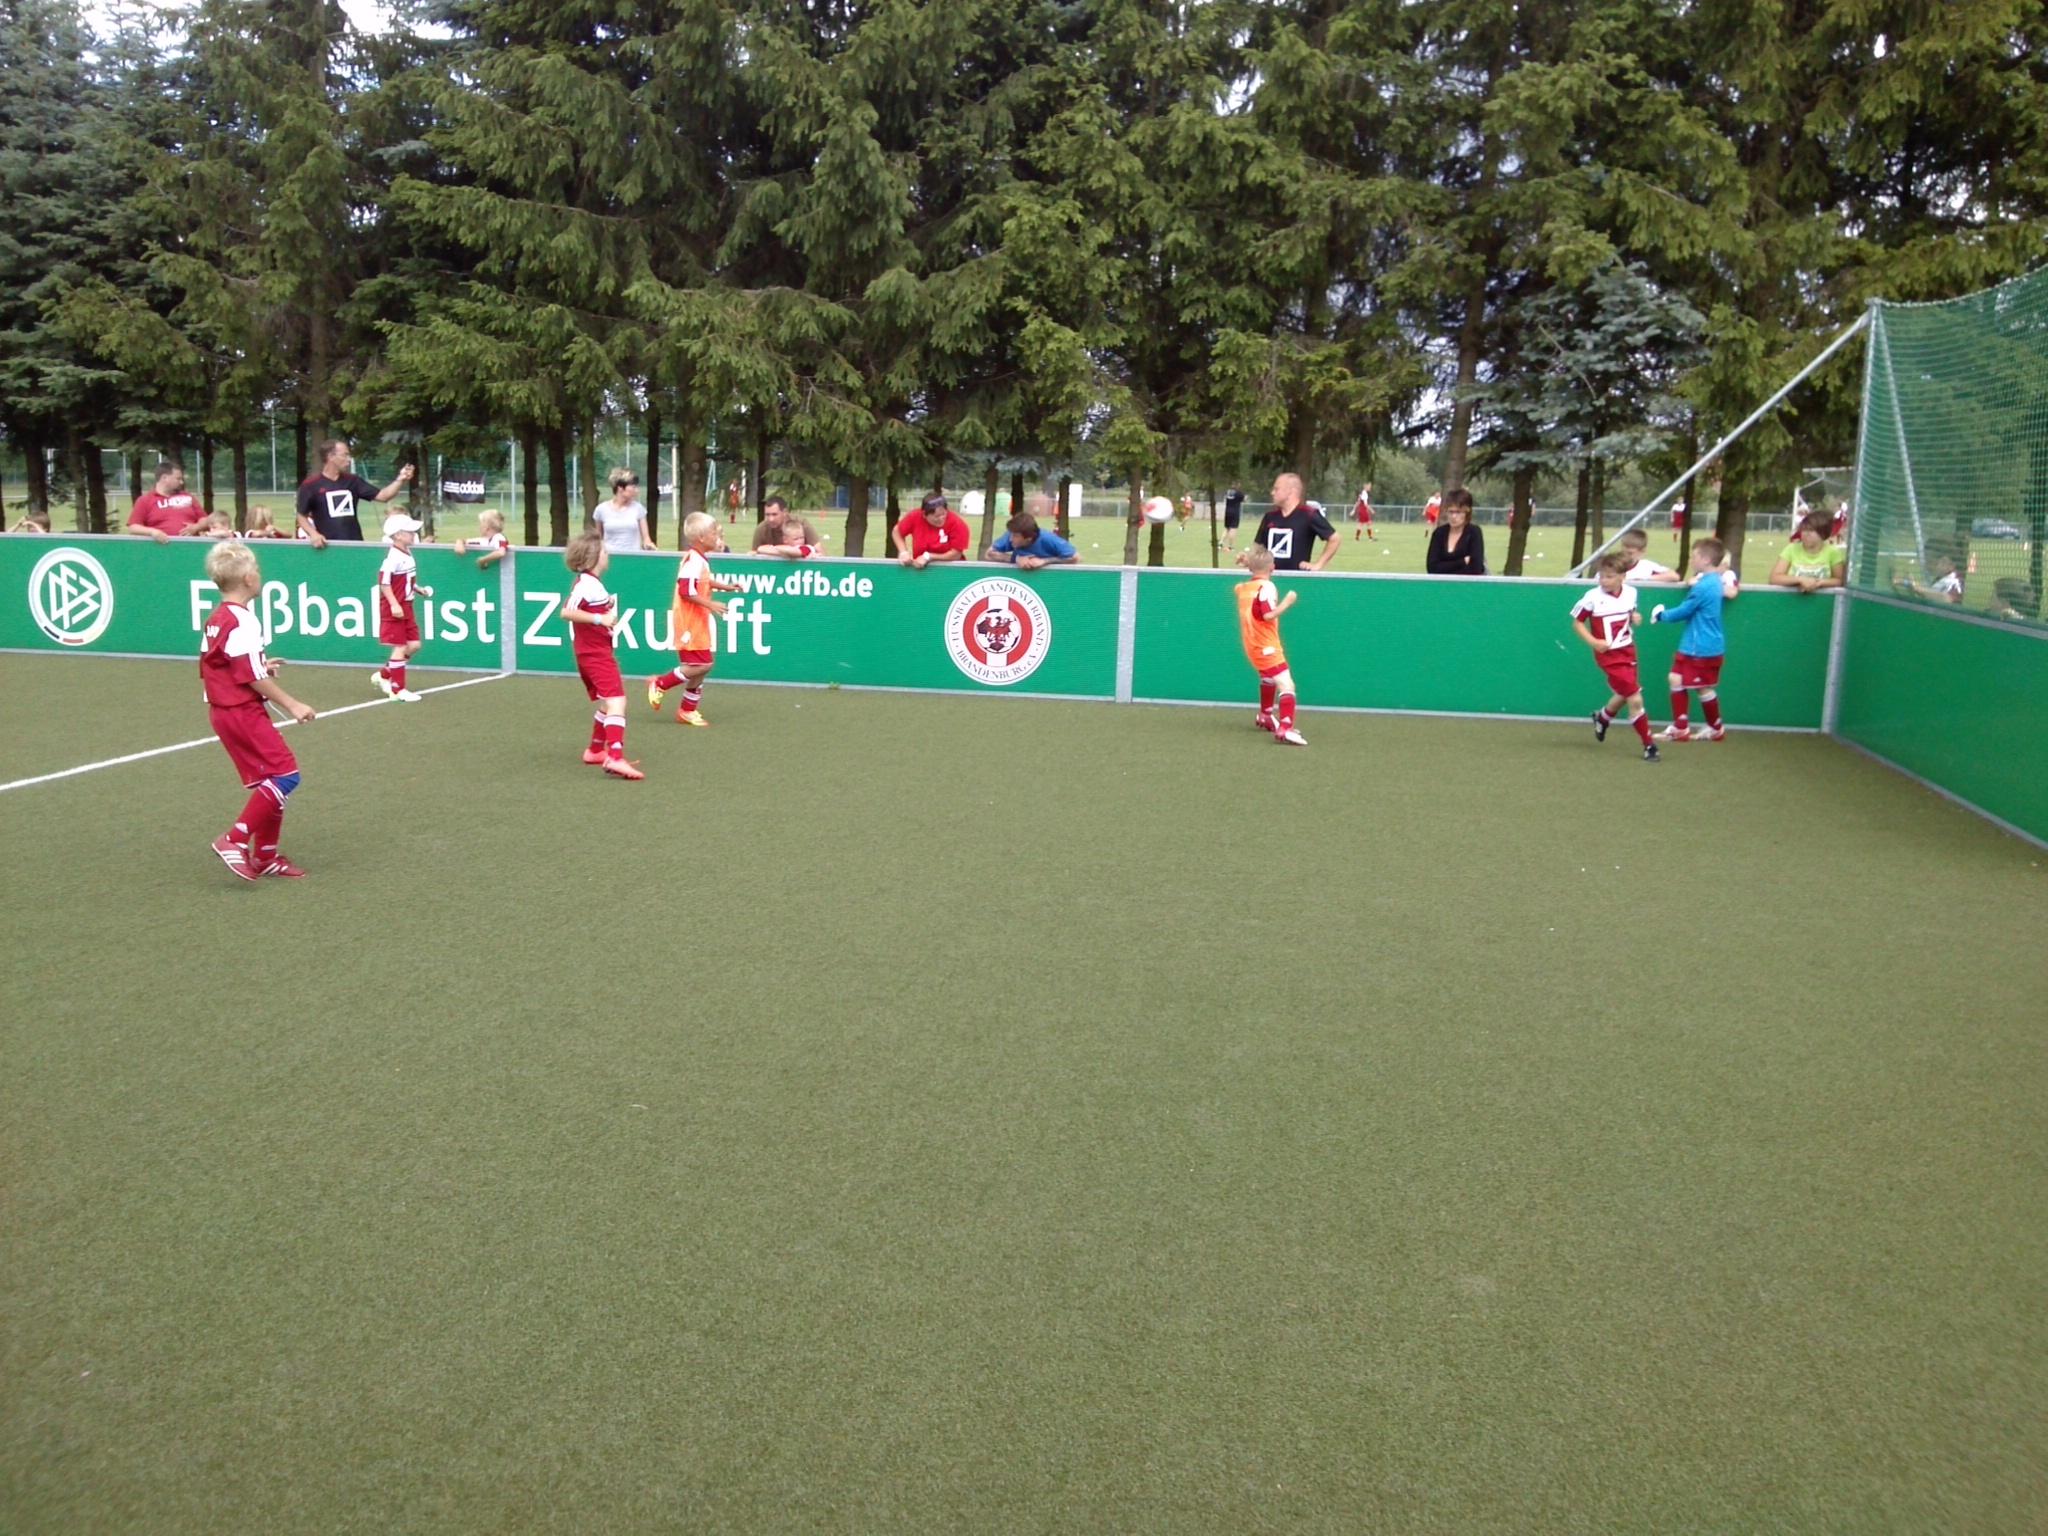 Kleinfeldfussball-beim-Kids-for-Champions-Fussballcamp-Blumenthal-2013